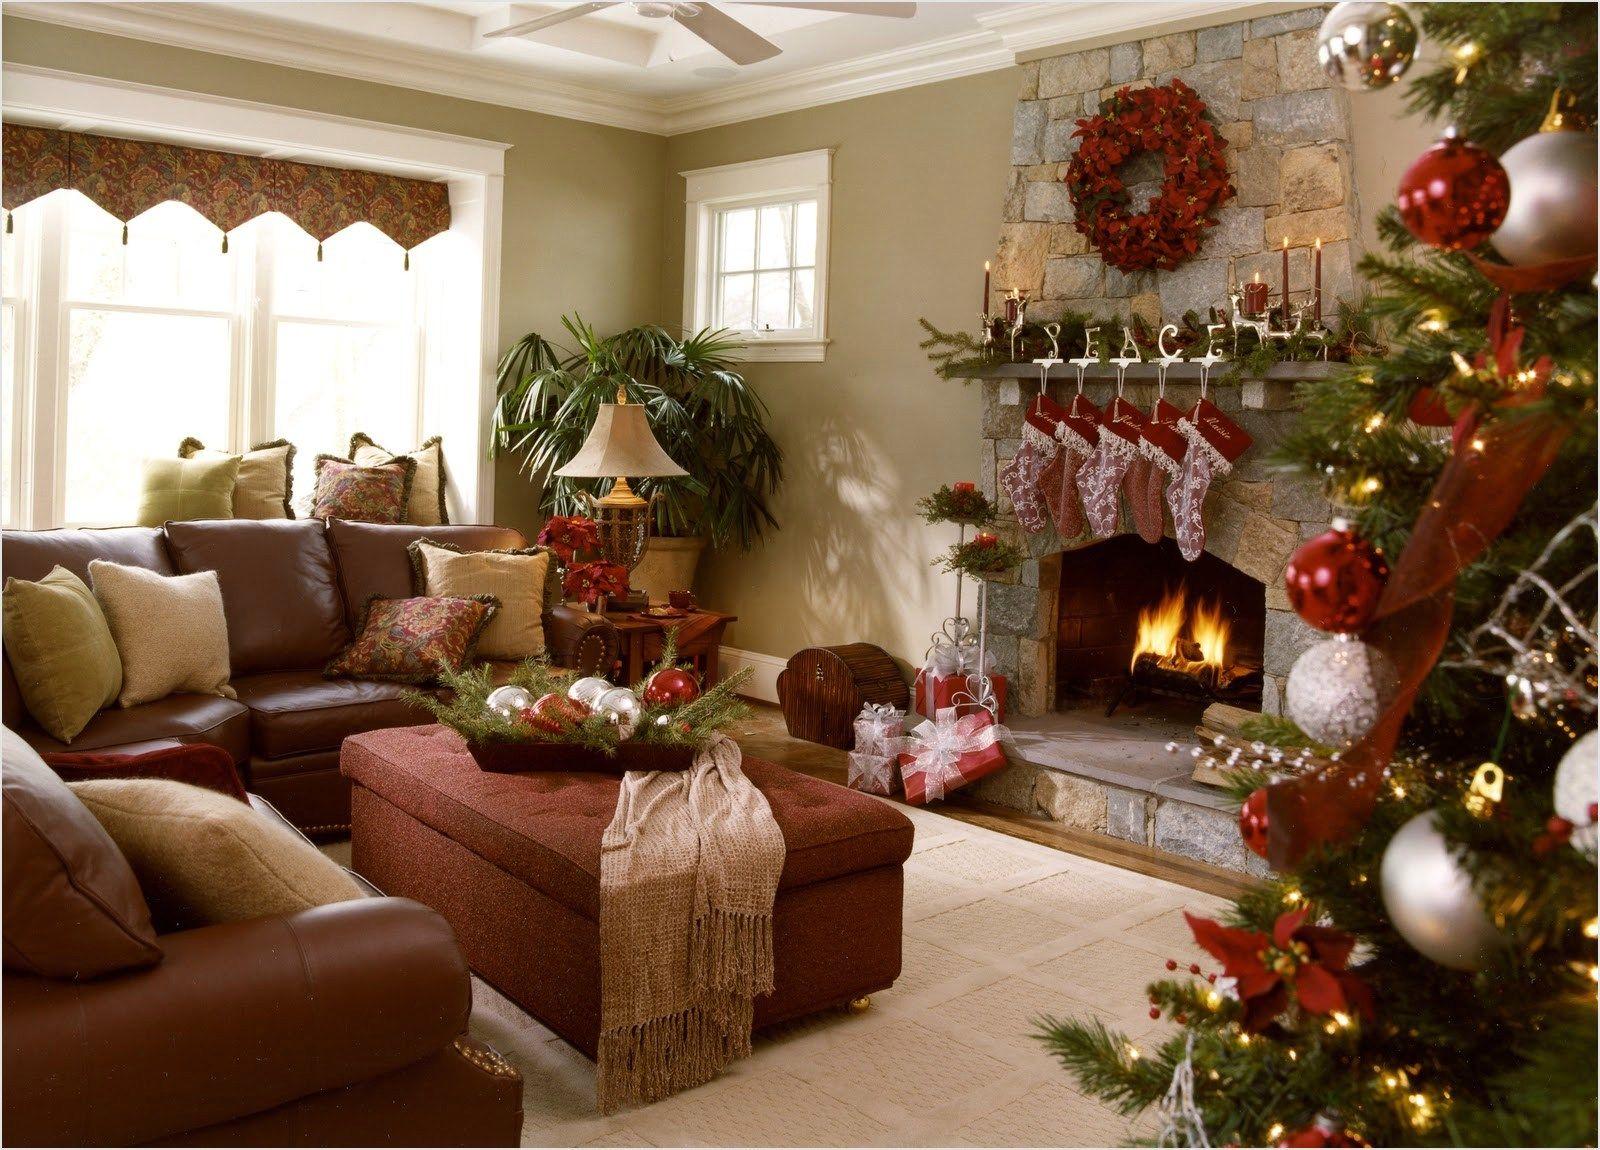 44 Simple Christmas Decorations Living Room Ideas Christmas Decorations Living Room Christmas Room Christmas Living Rooms